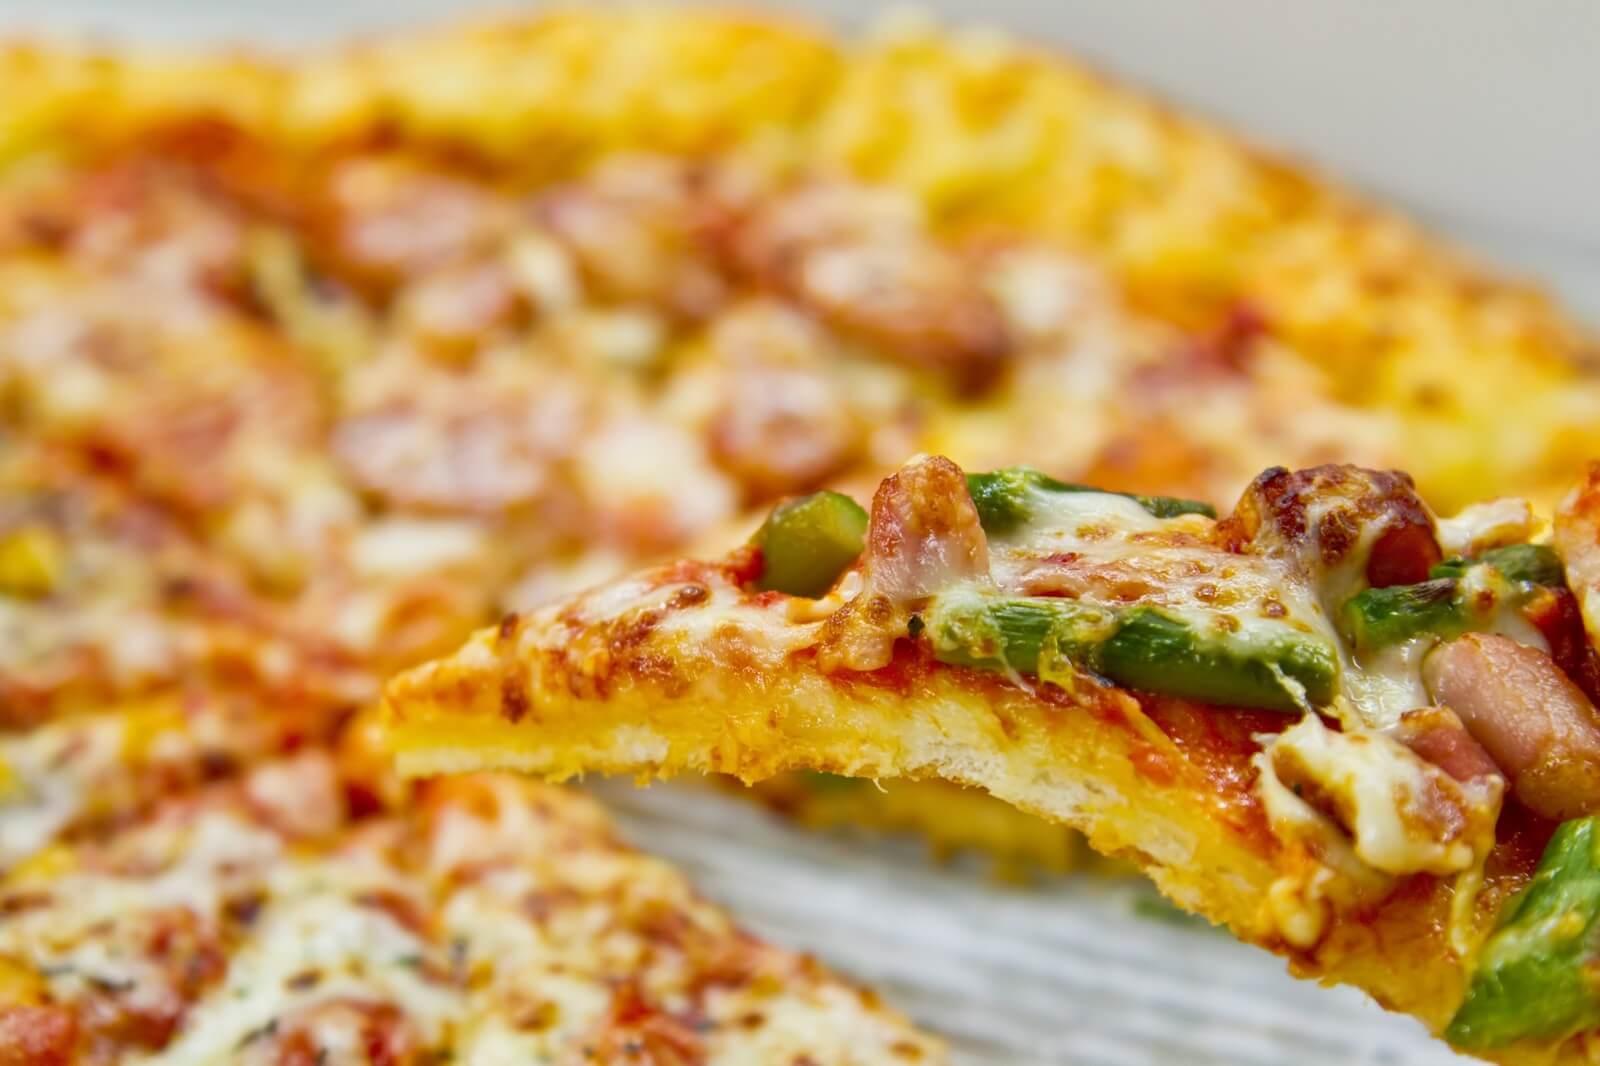 MOK_hitokirenopizza_TP_V